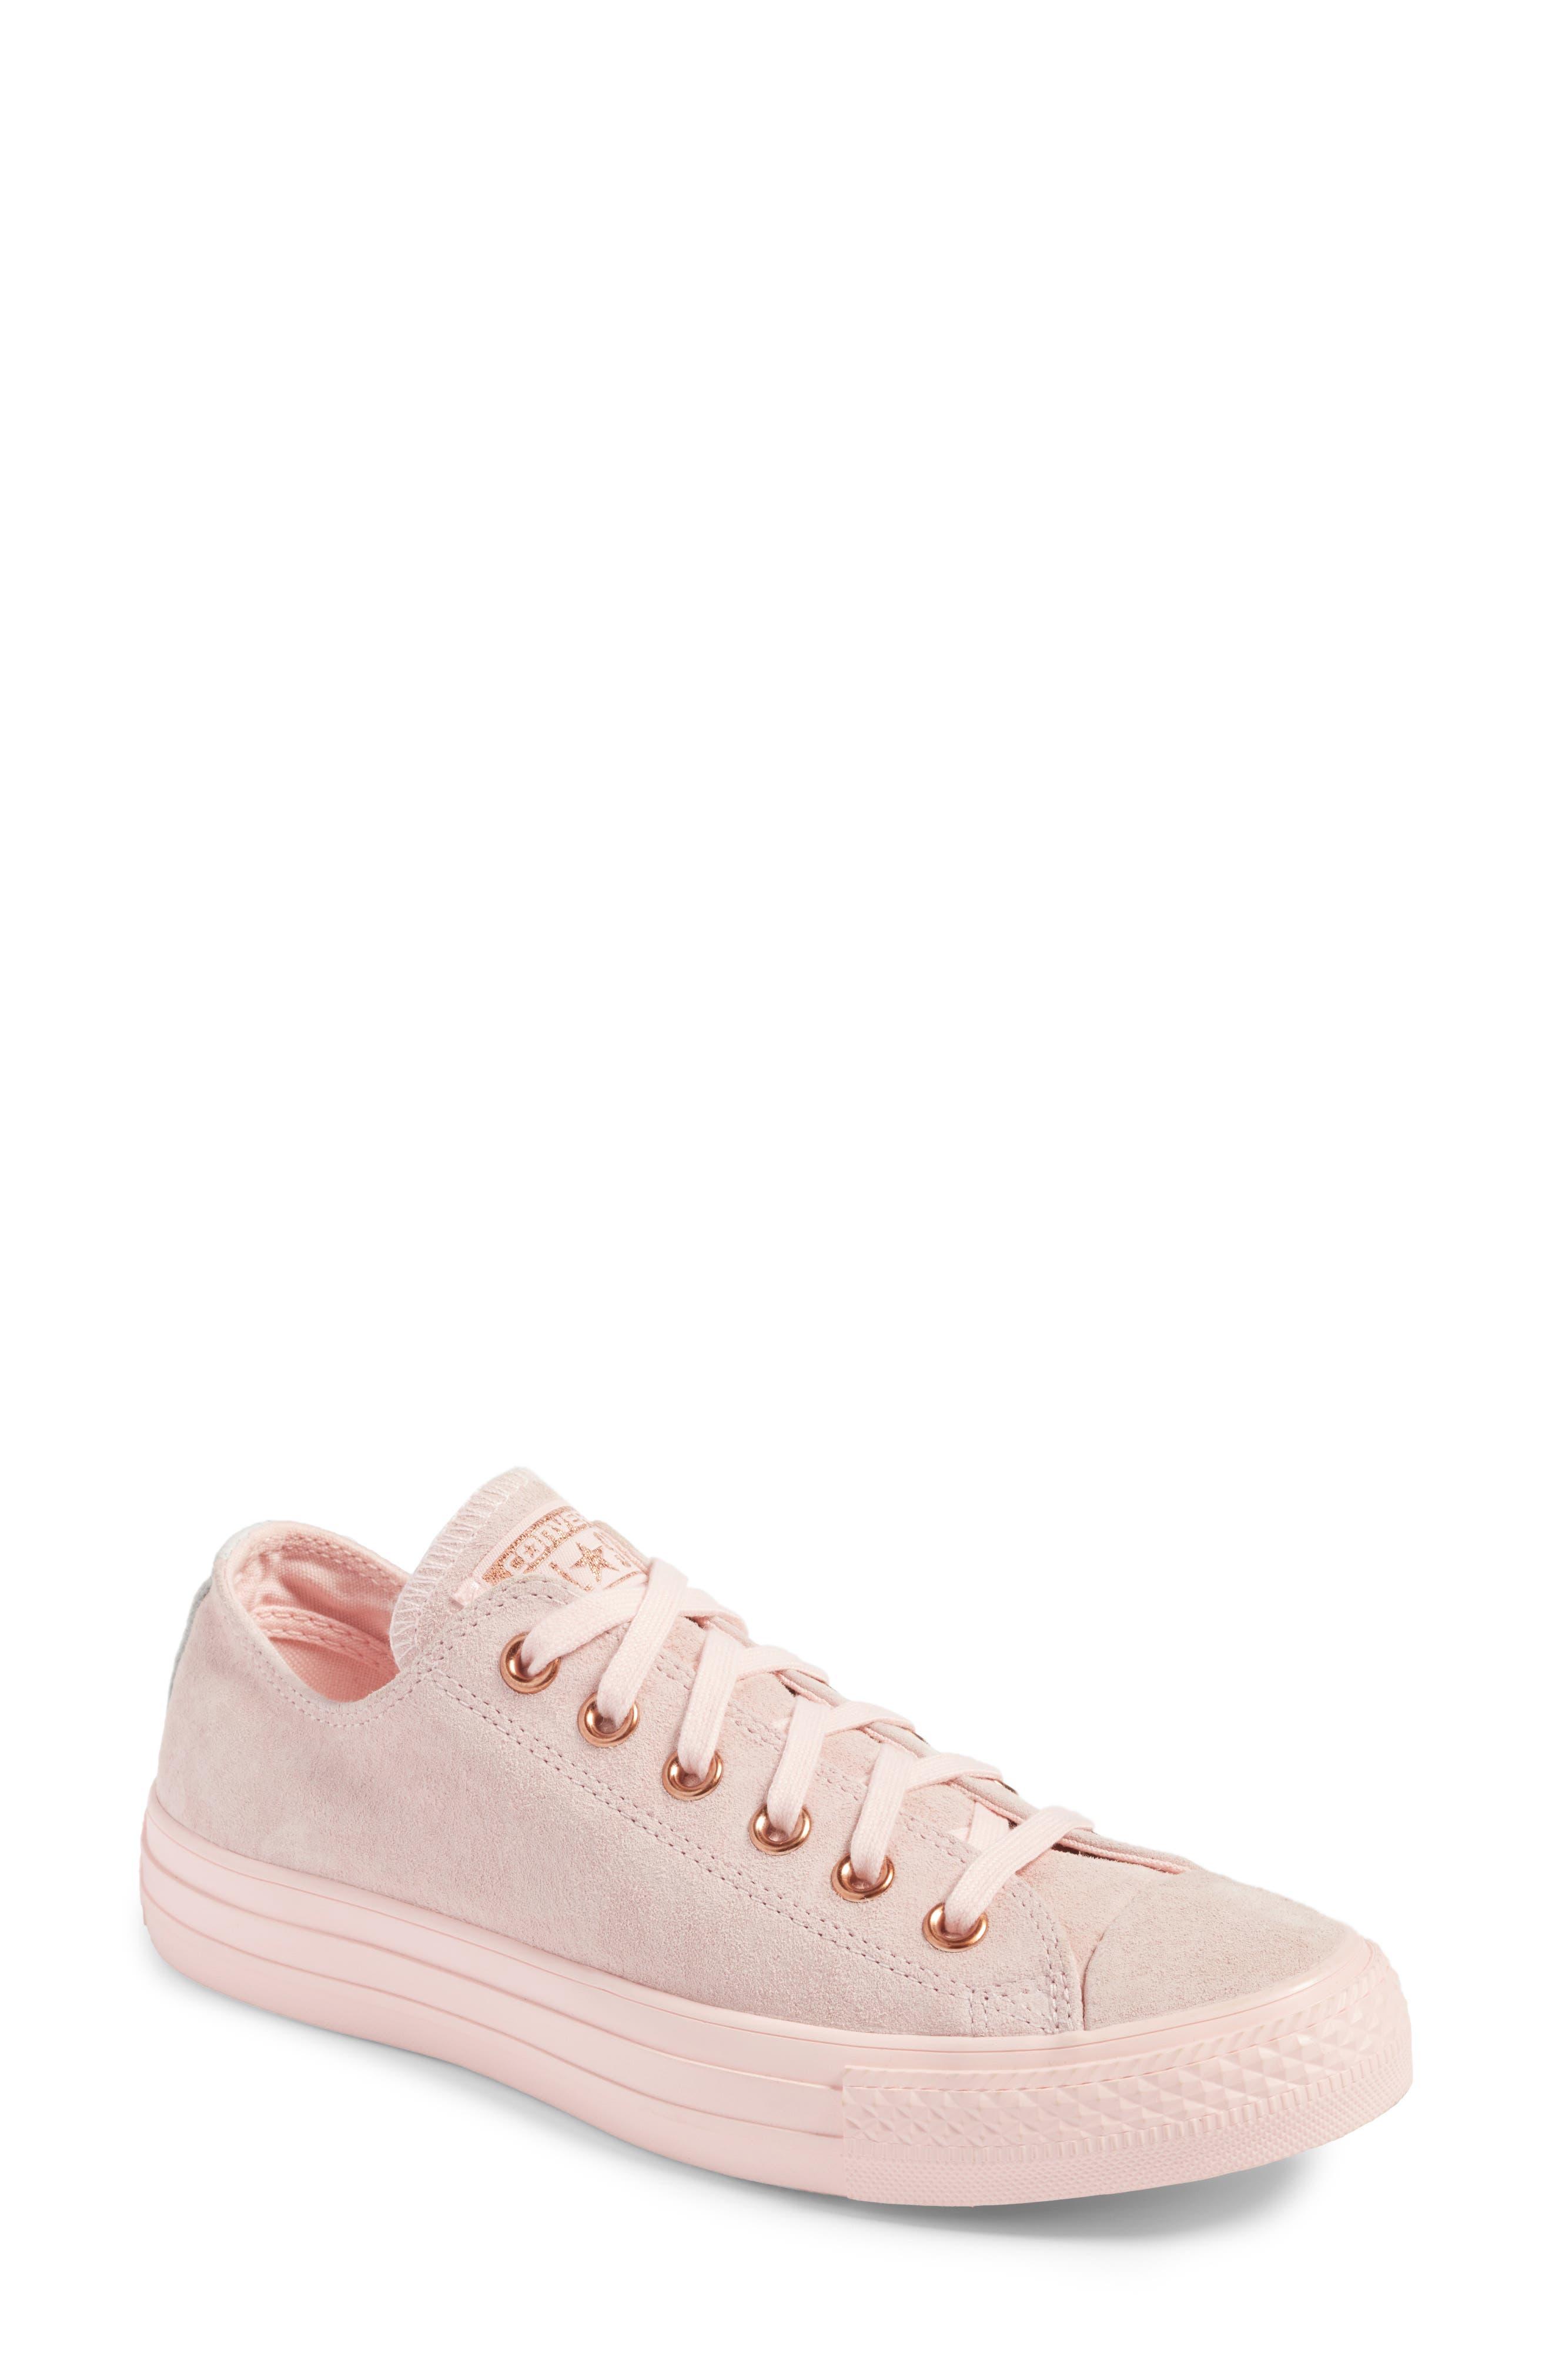 Converse Blossom Sneaker (Women)